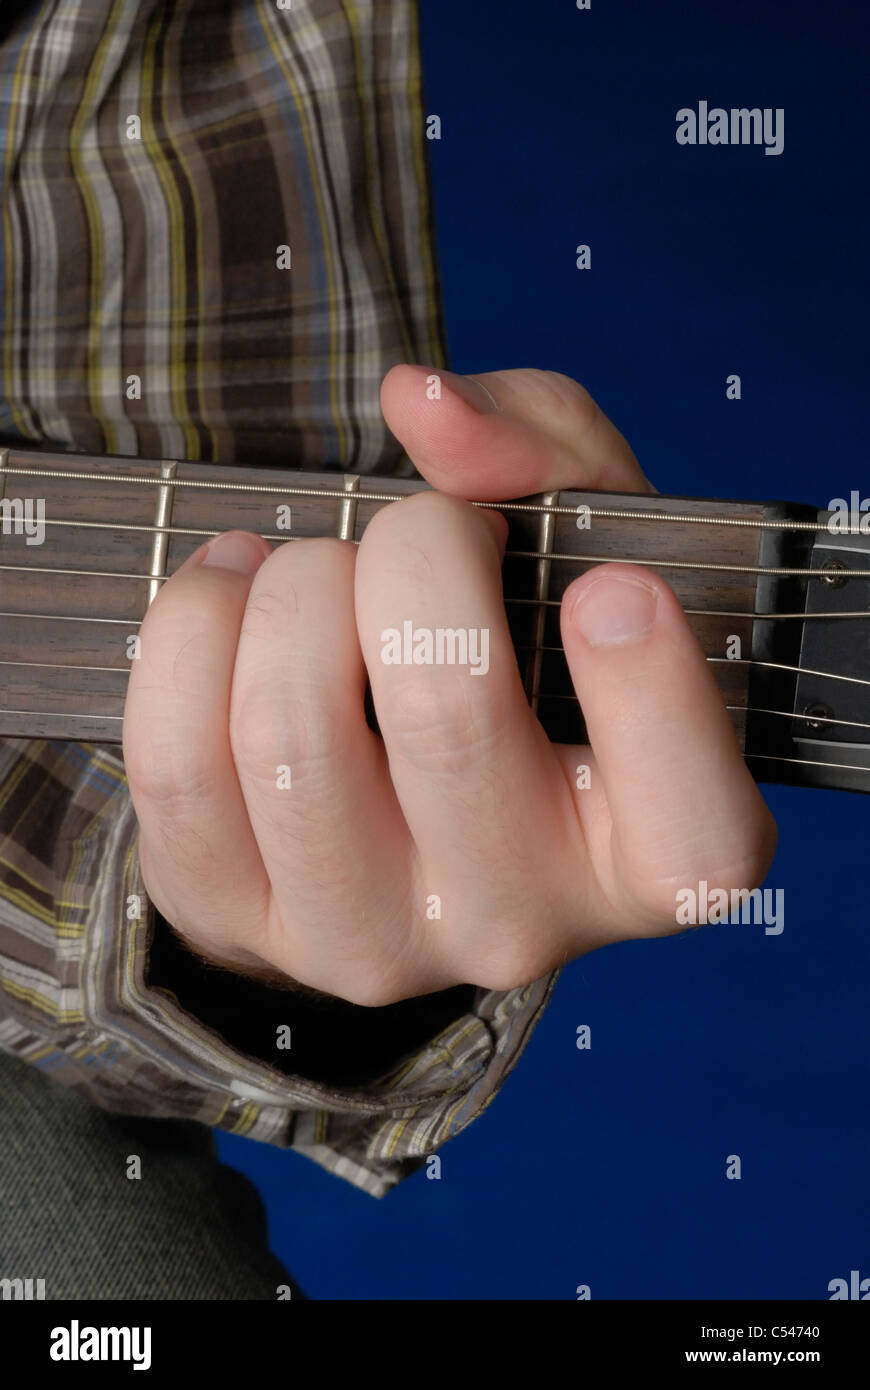 E Minor Guitar Chord Stock Photos E Minor Guitar Chord Stock